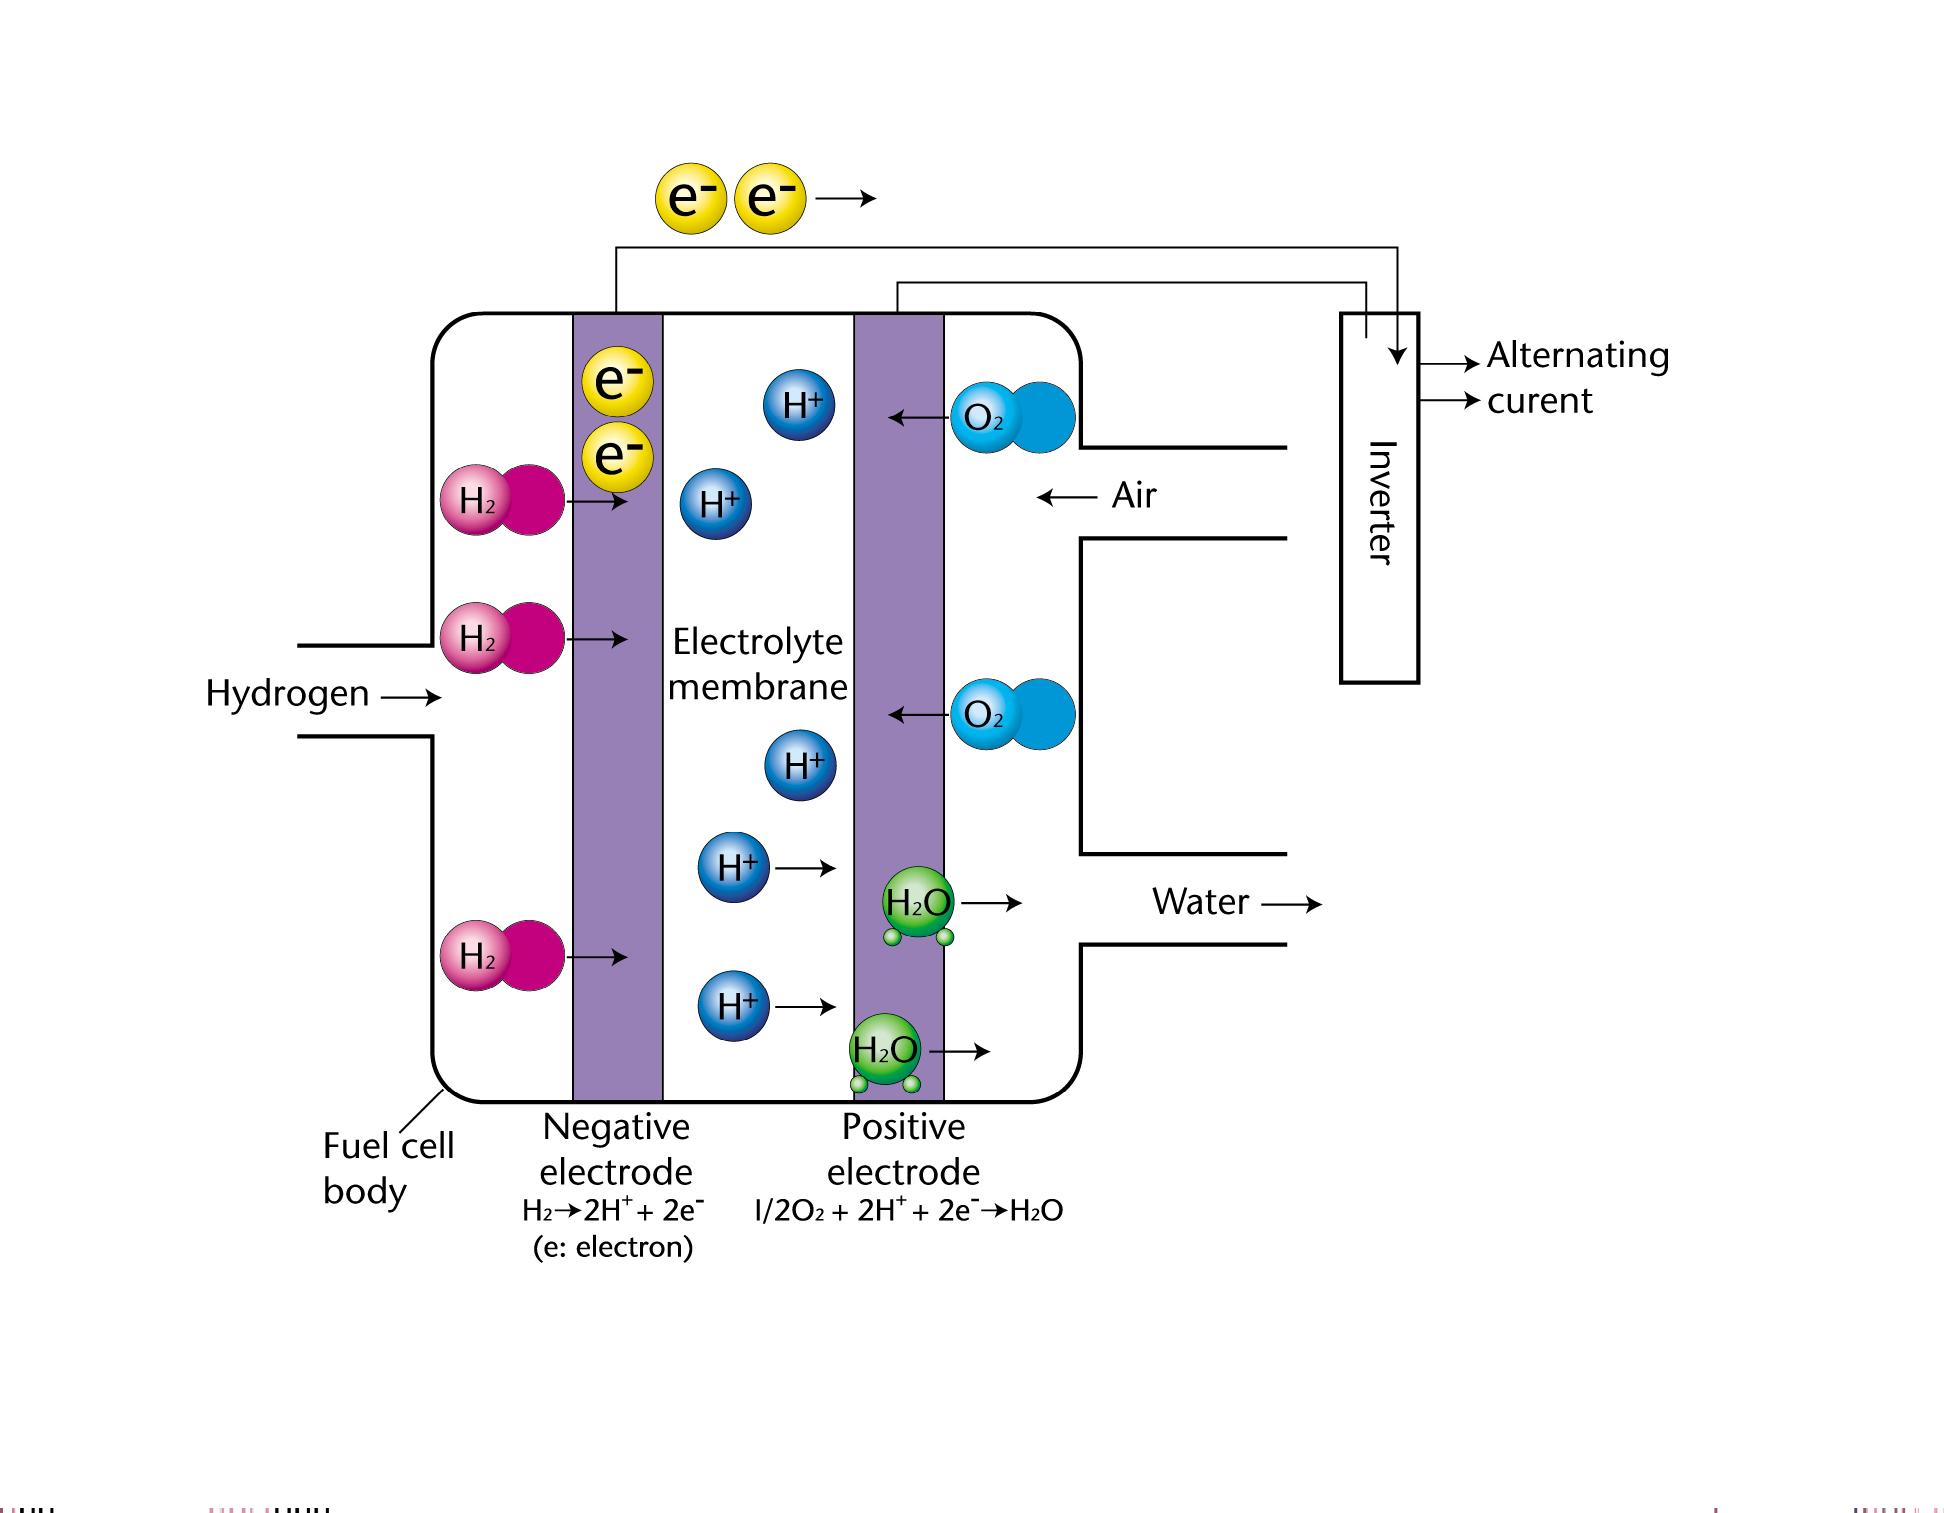 fuel cell EG_41